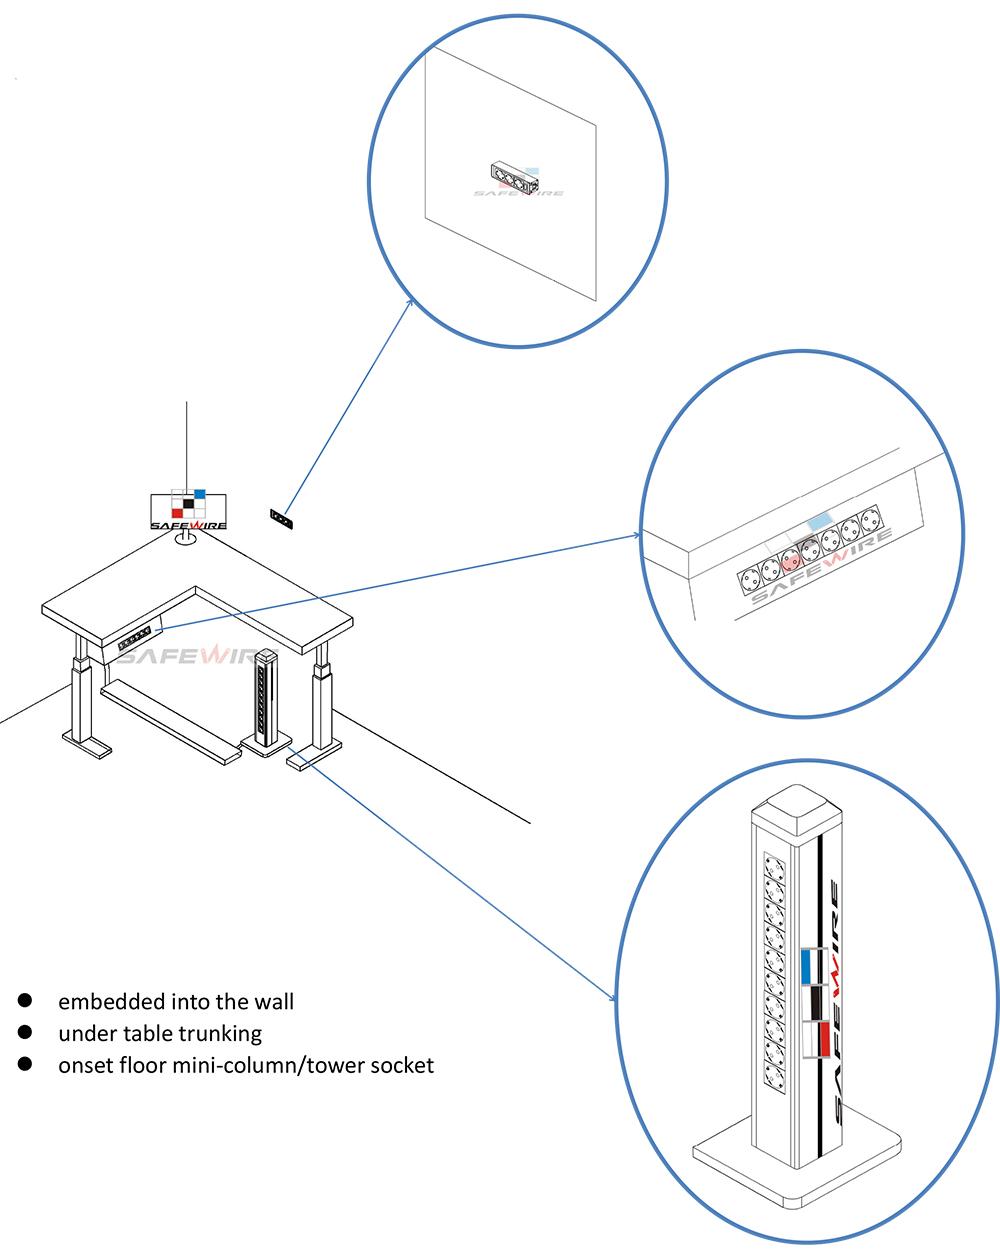 Safewire Datasheet 45 type  Safety shutter multi-sockets XJY-QB-35-1-2-3 M200505-3